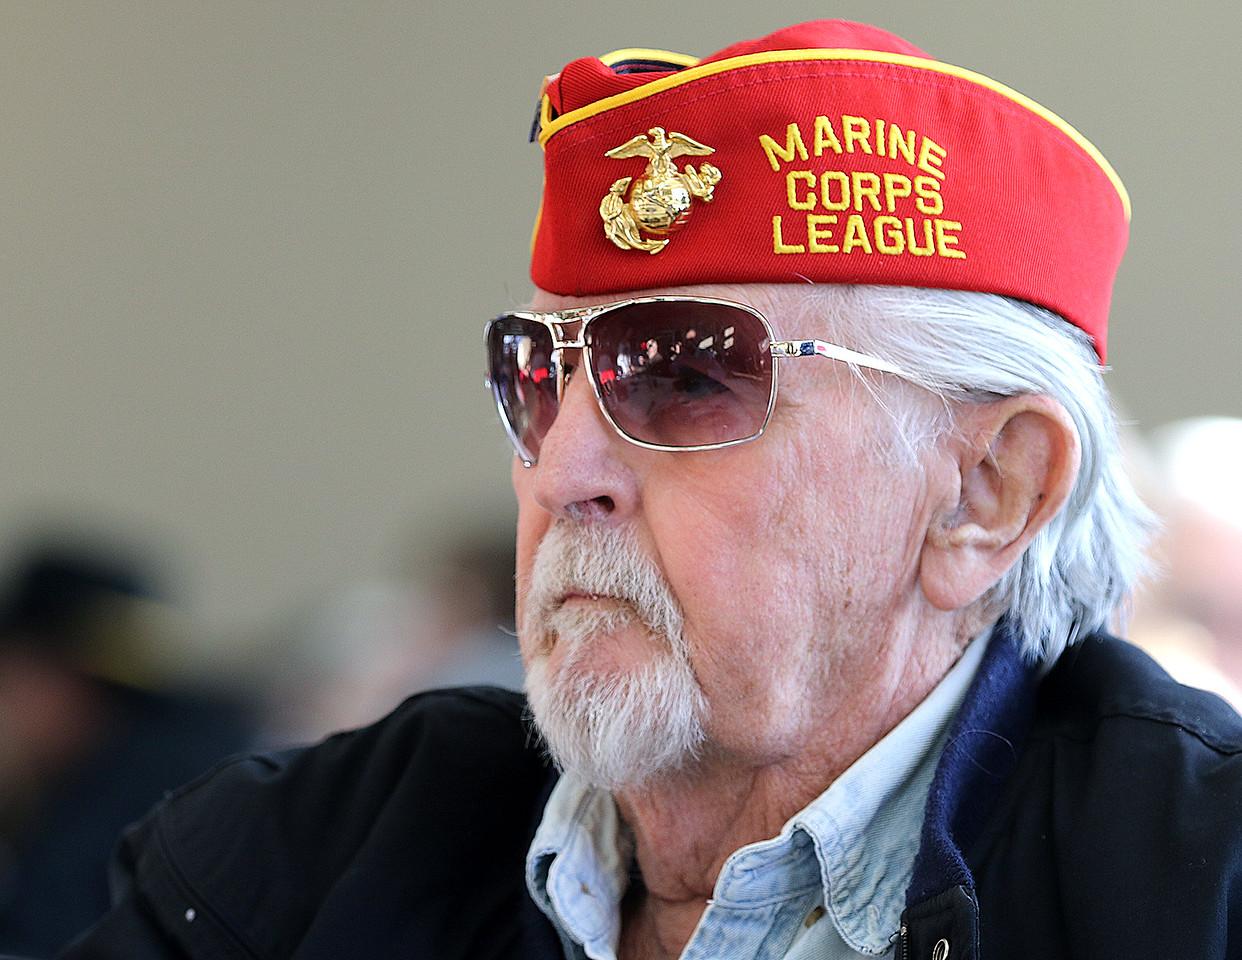 hnews_sun1113_Marlowe_veterans_Loughran